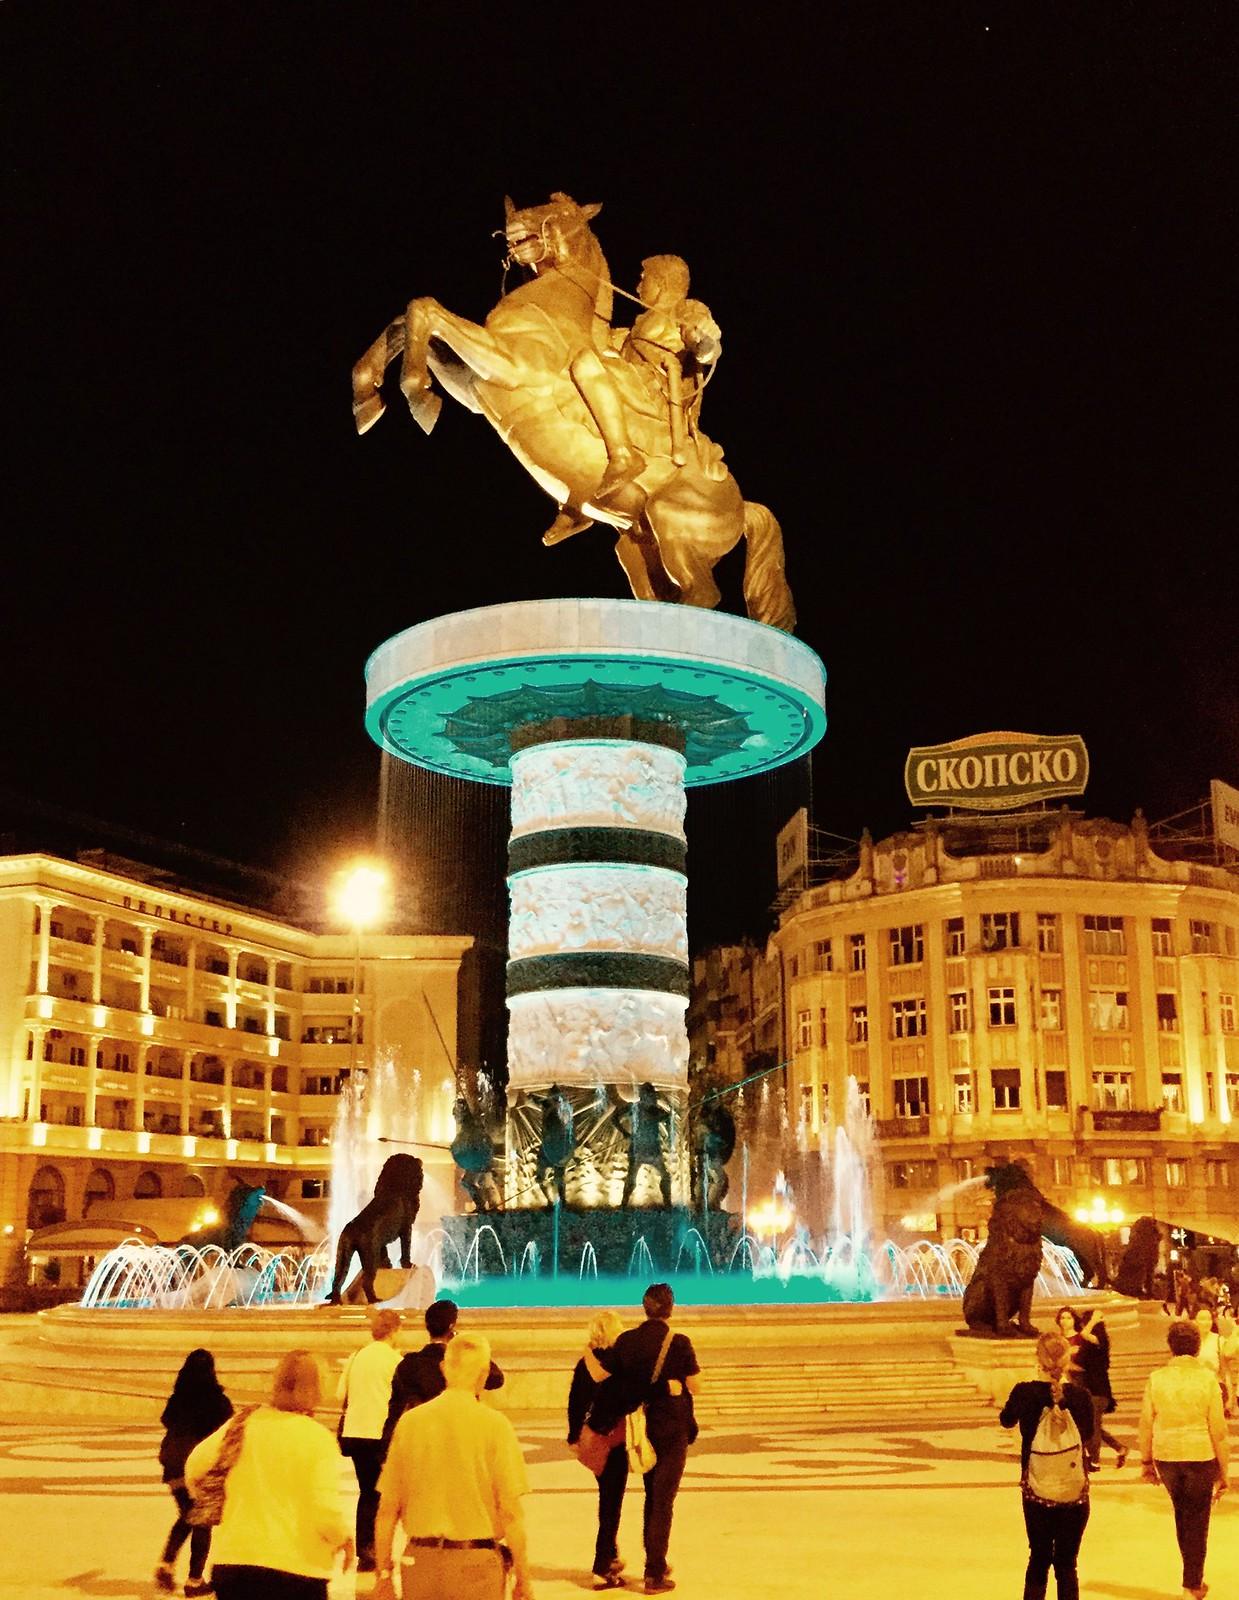 201705 - Balkans - Statue of Alexander the Great - 92 of 101 - Macedonia Square - Skopje, Skopje, May 30, 2017